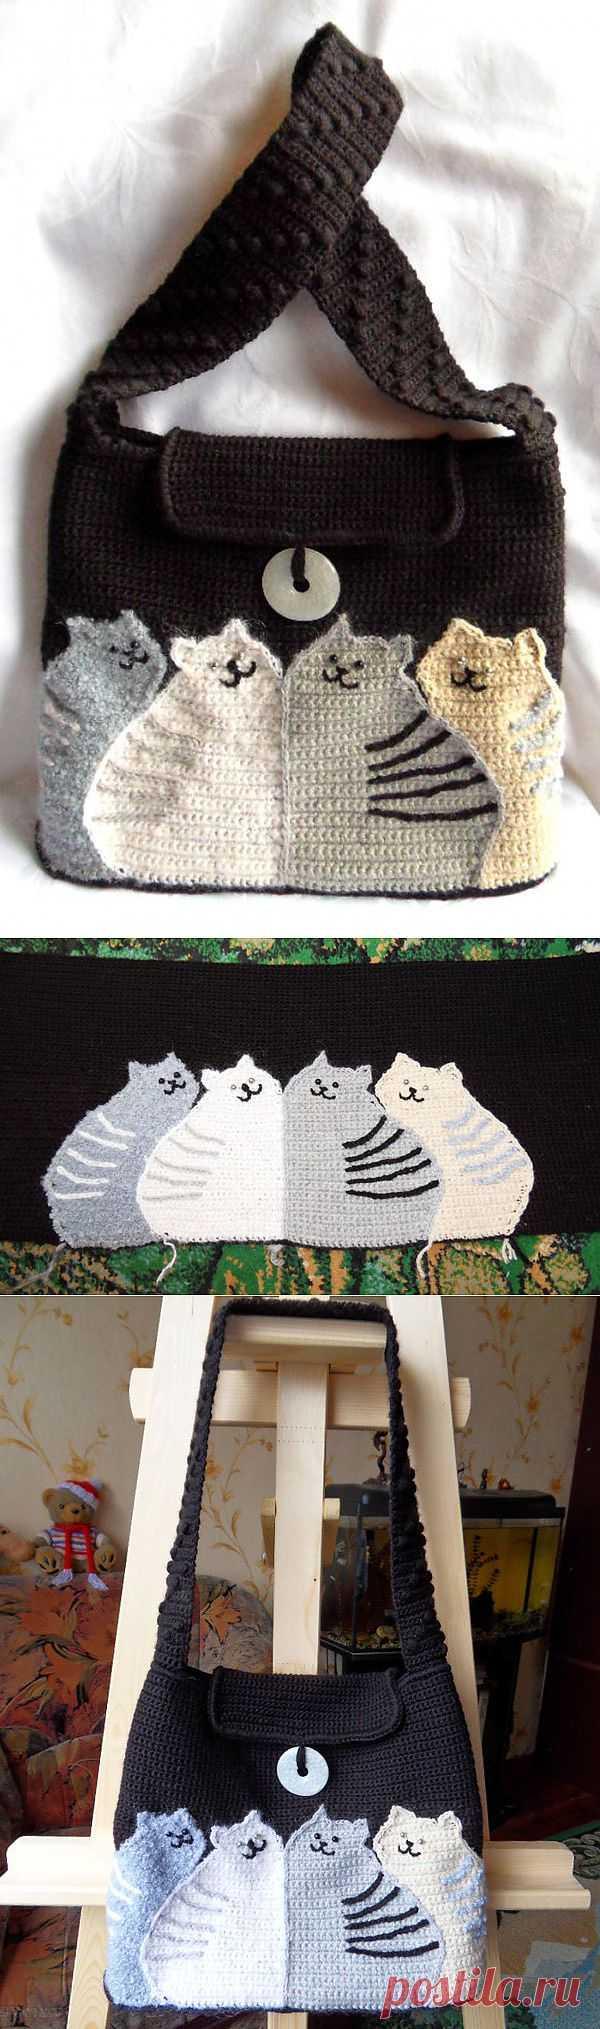 Коты   Вязаные сумки